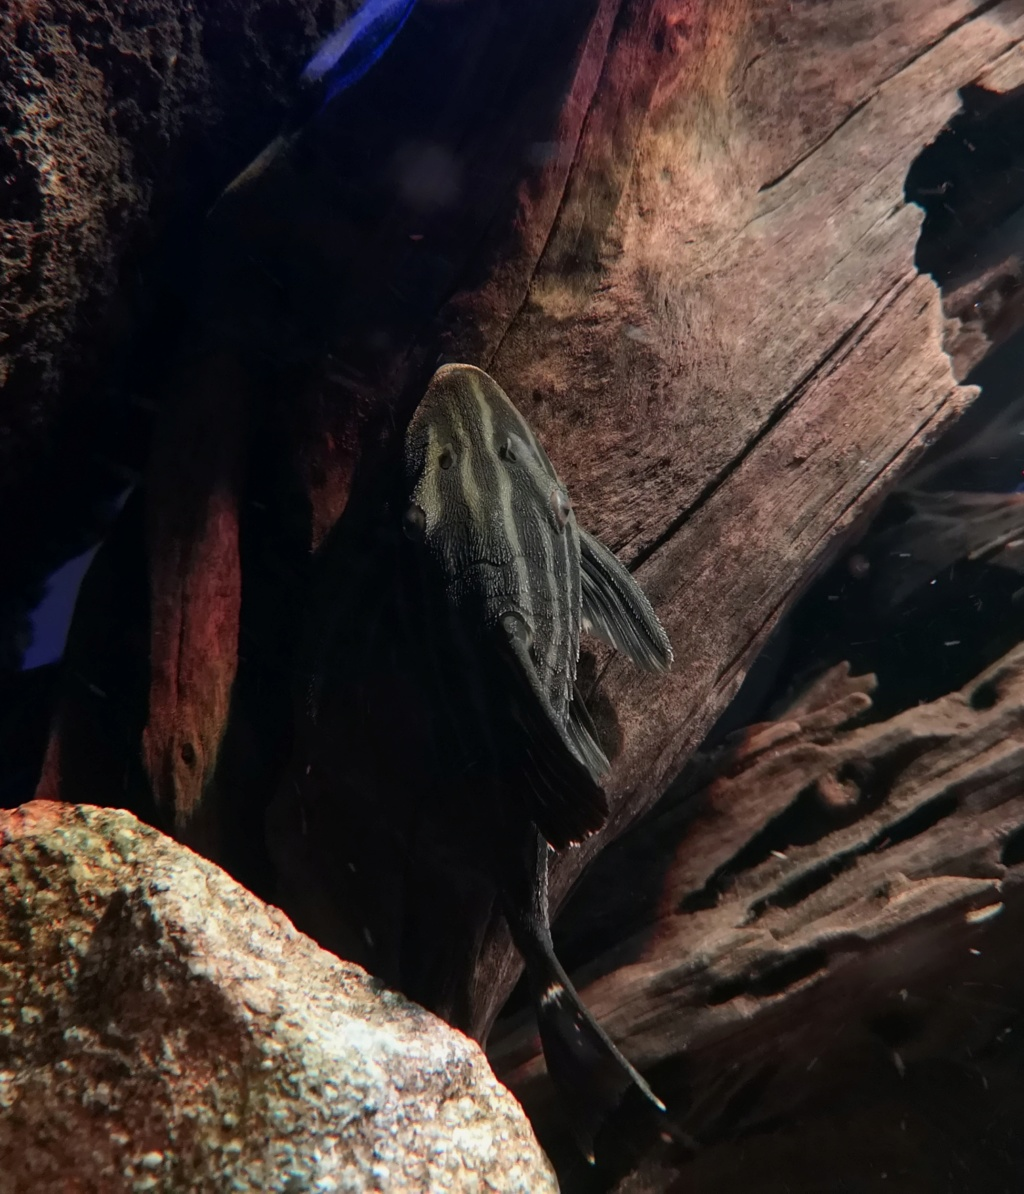 Panaque cf. armbrusteri xingu (L27) - Página 2 Img_2119